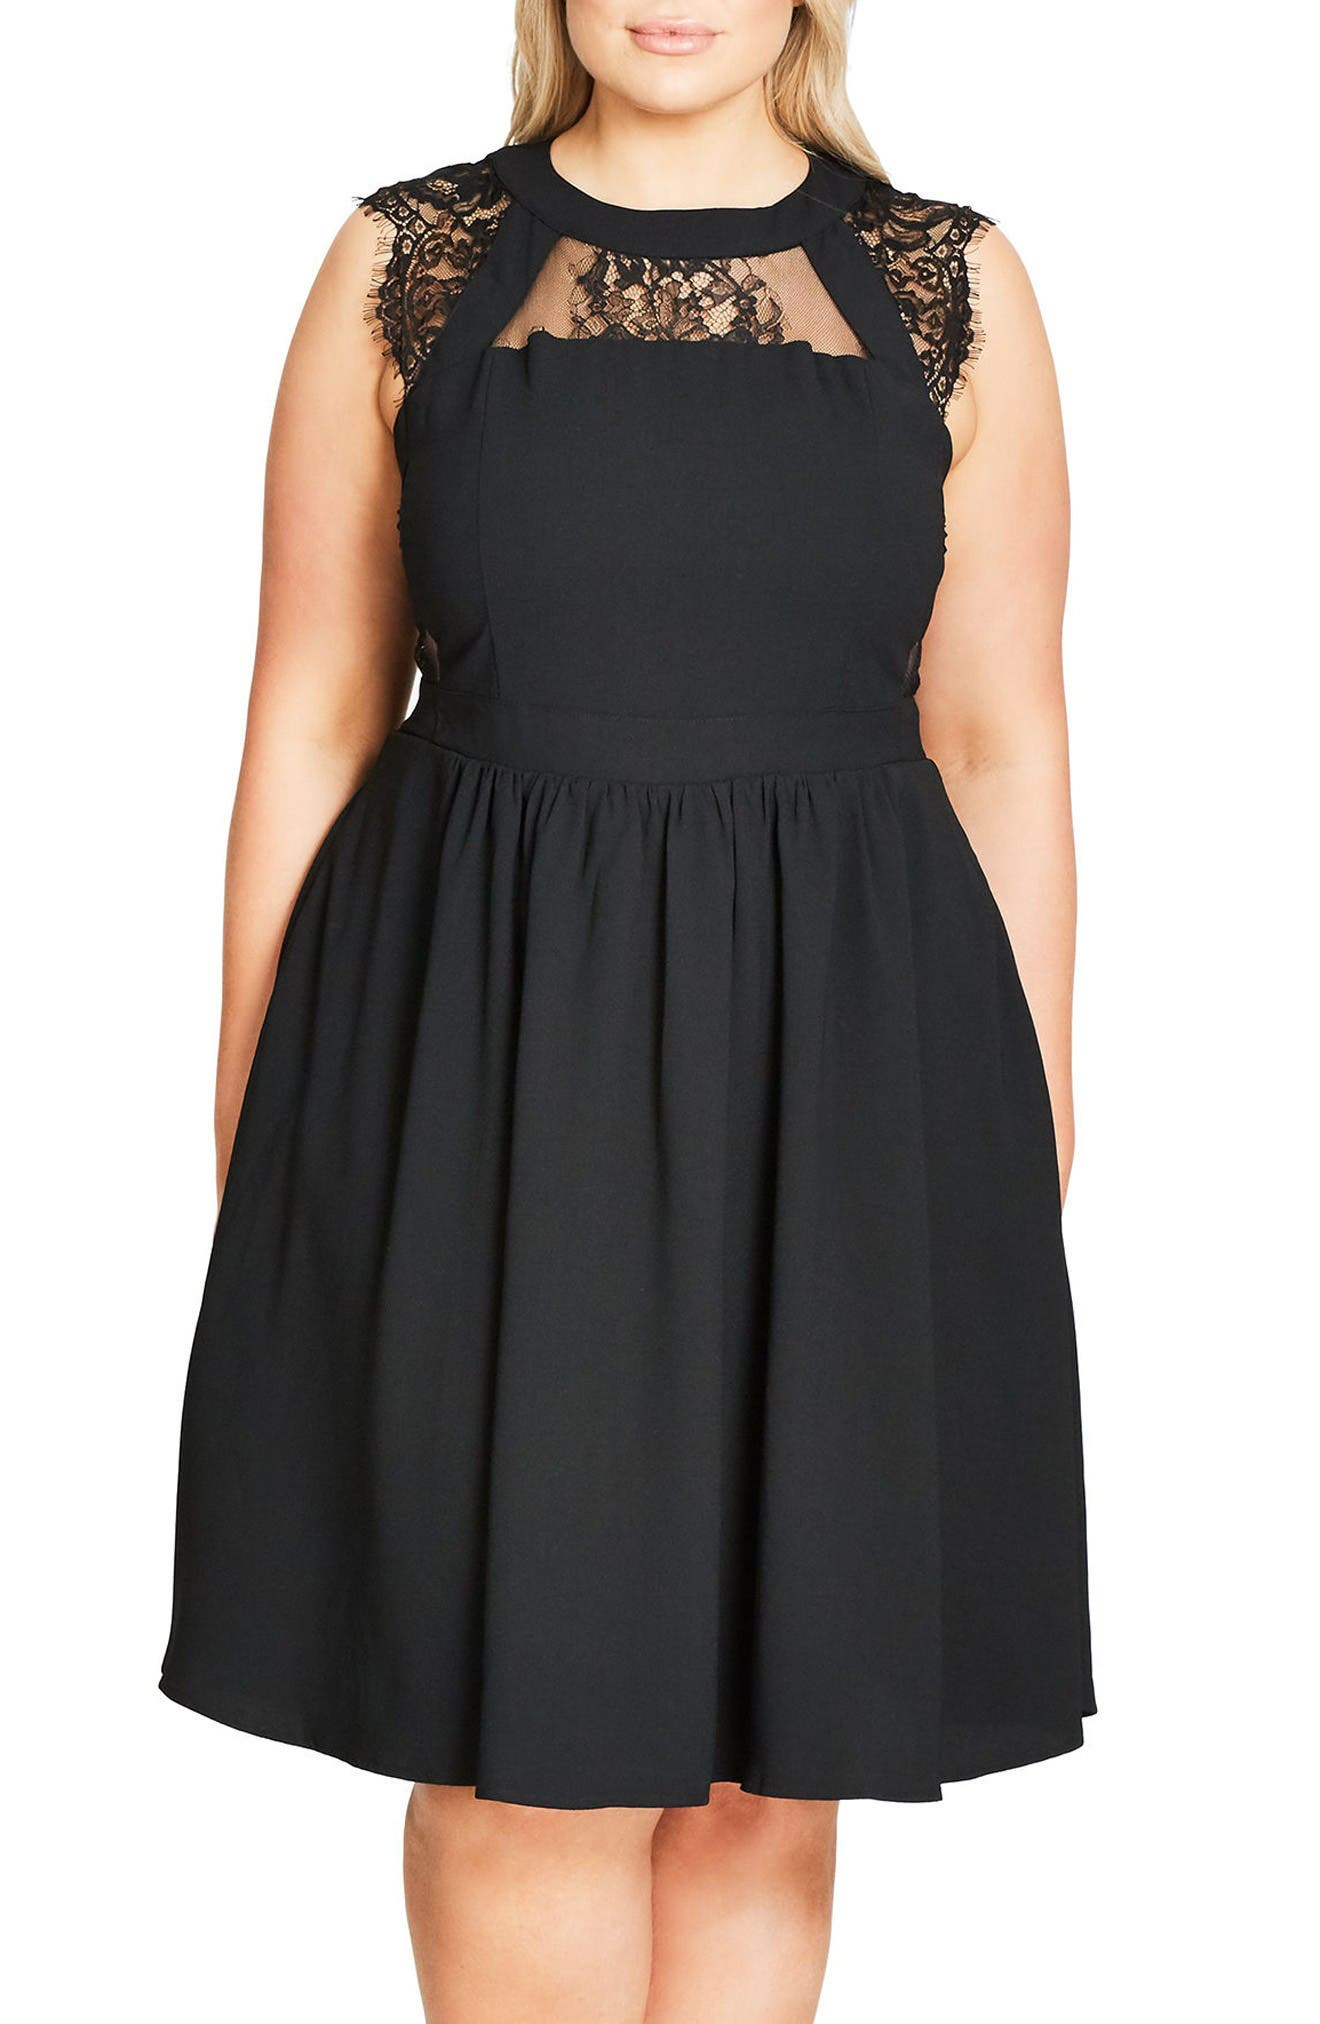 Cage Dress,                         Main,                         color, Black